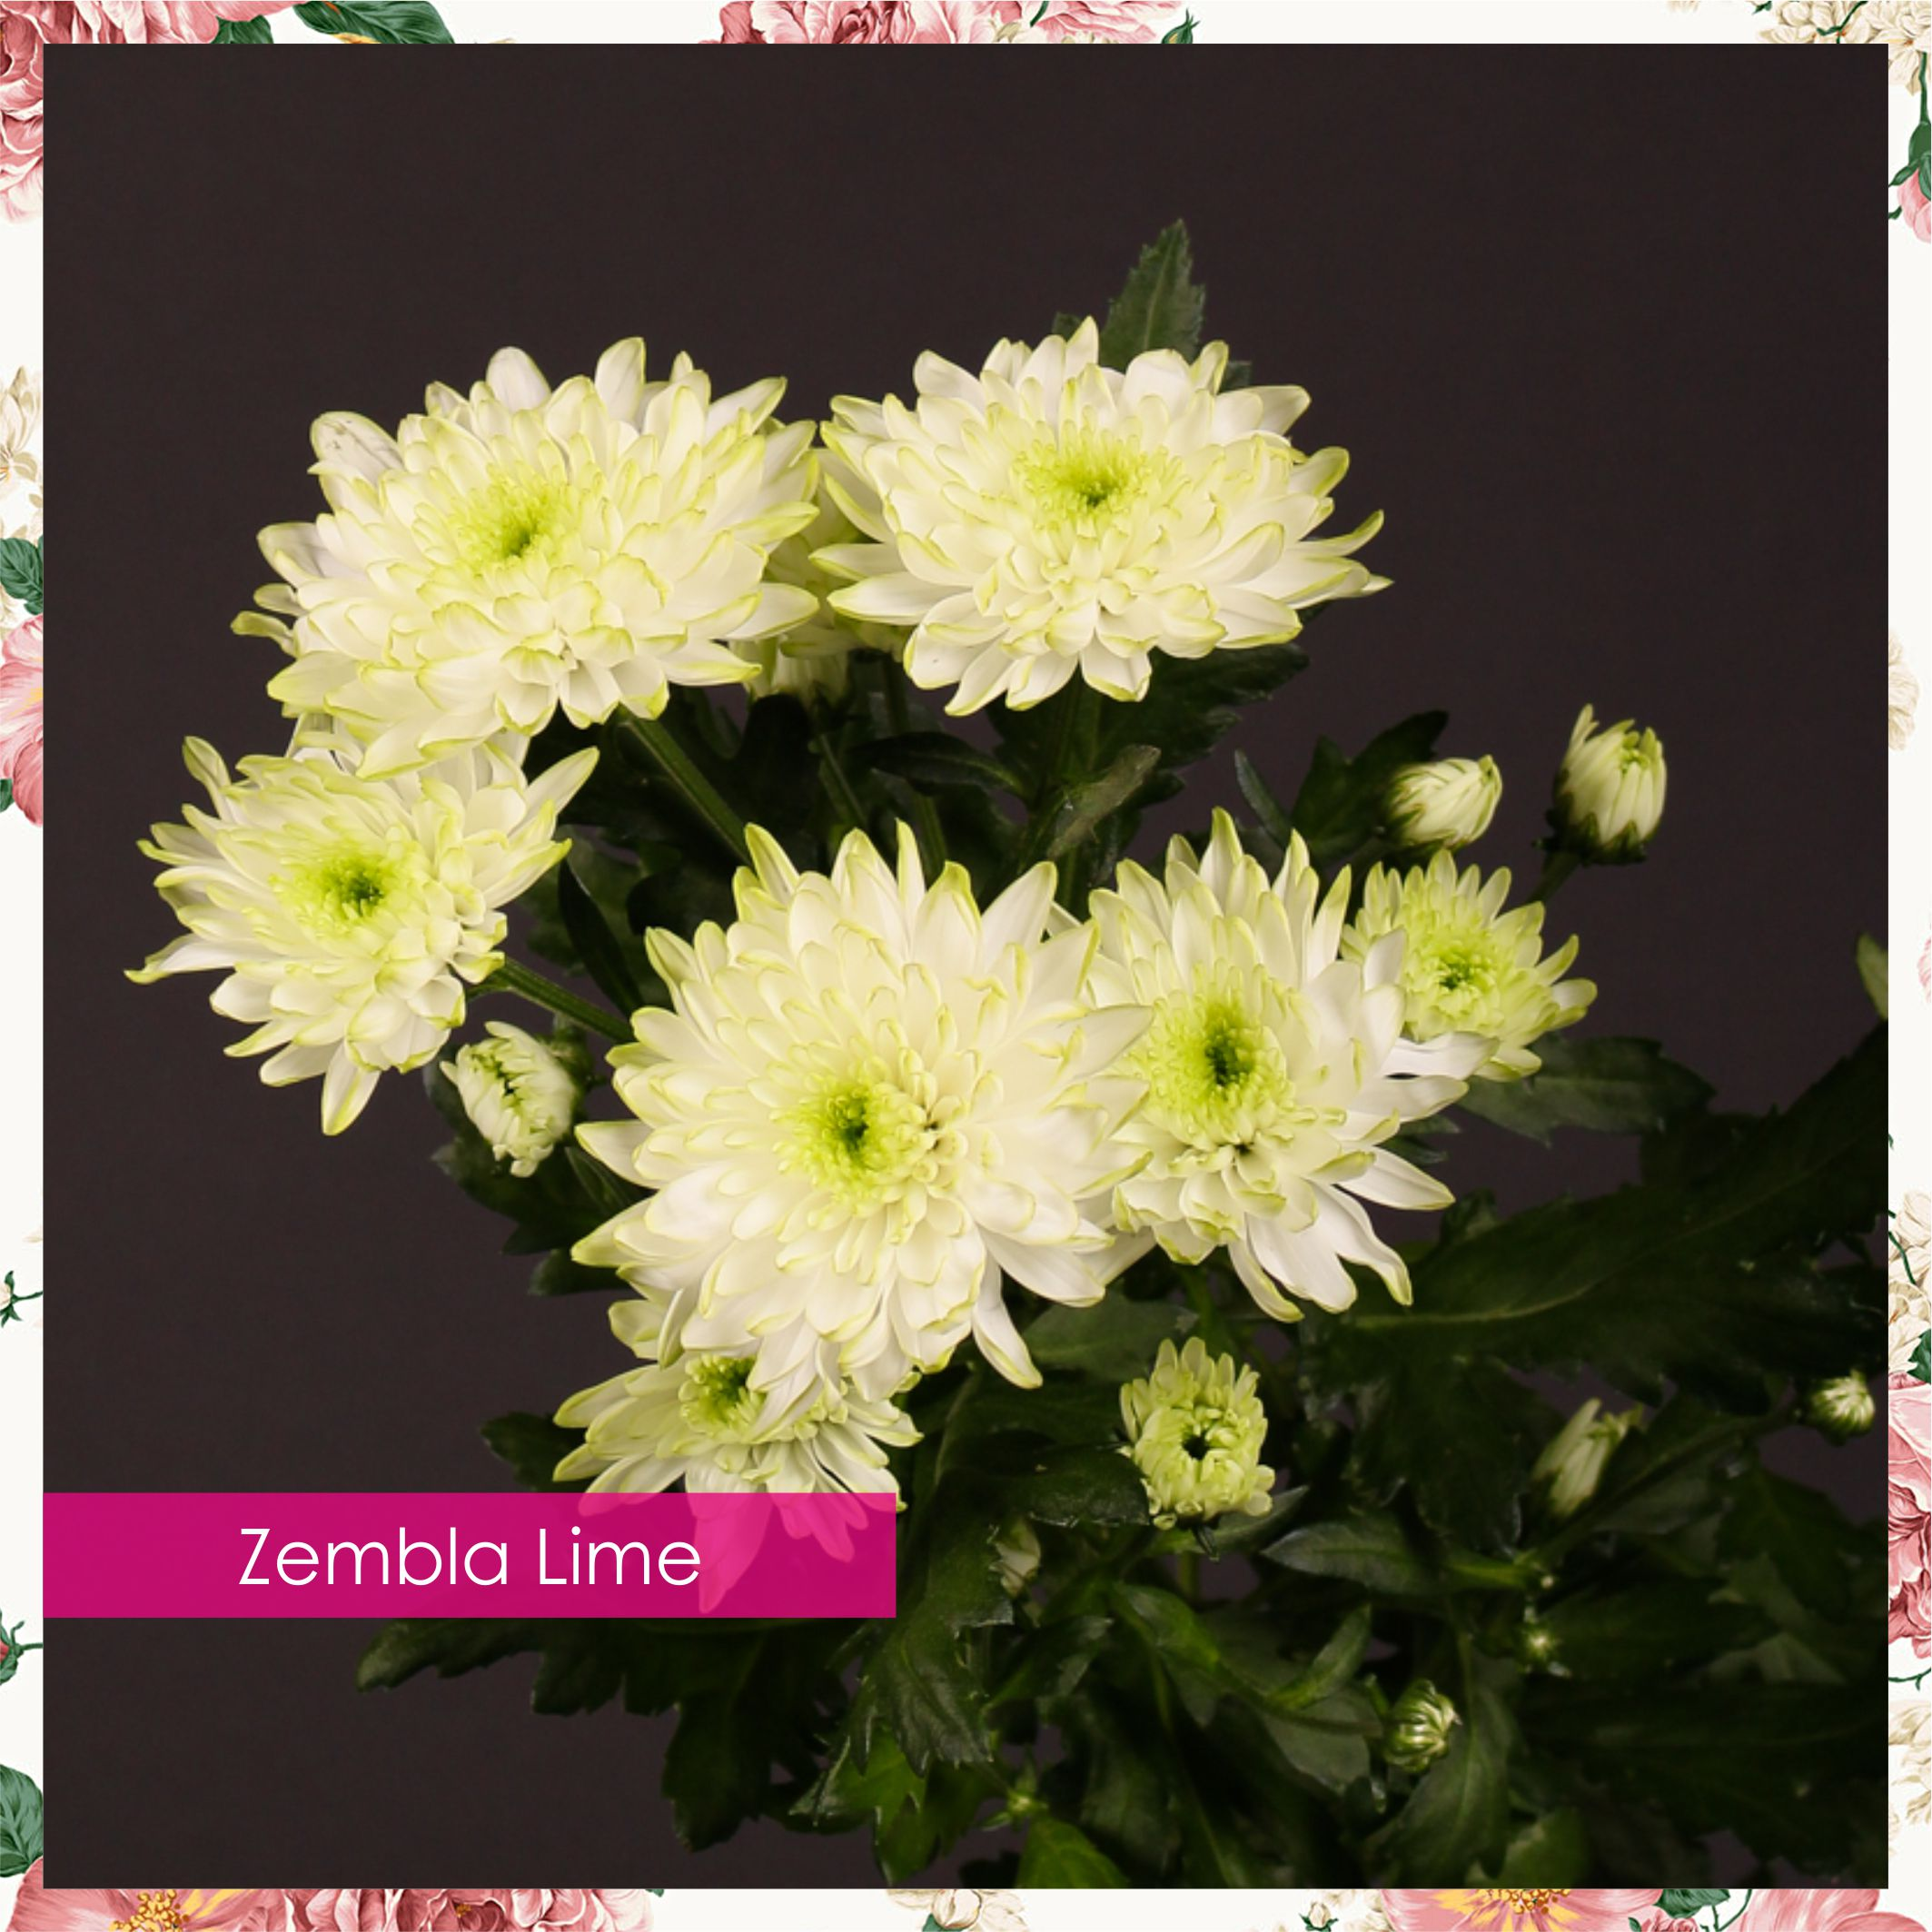 Цветы юга прайс на хризантему, цветы